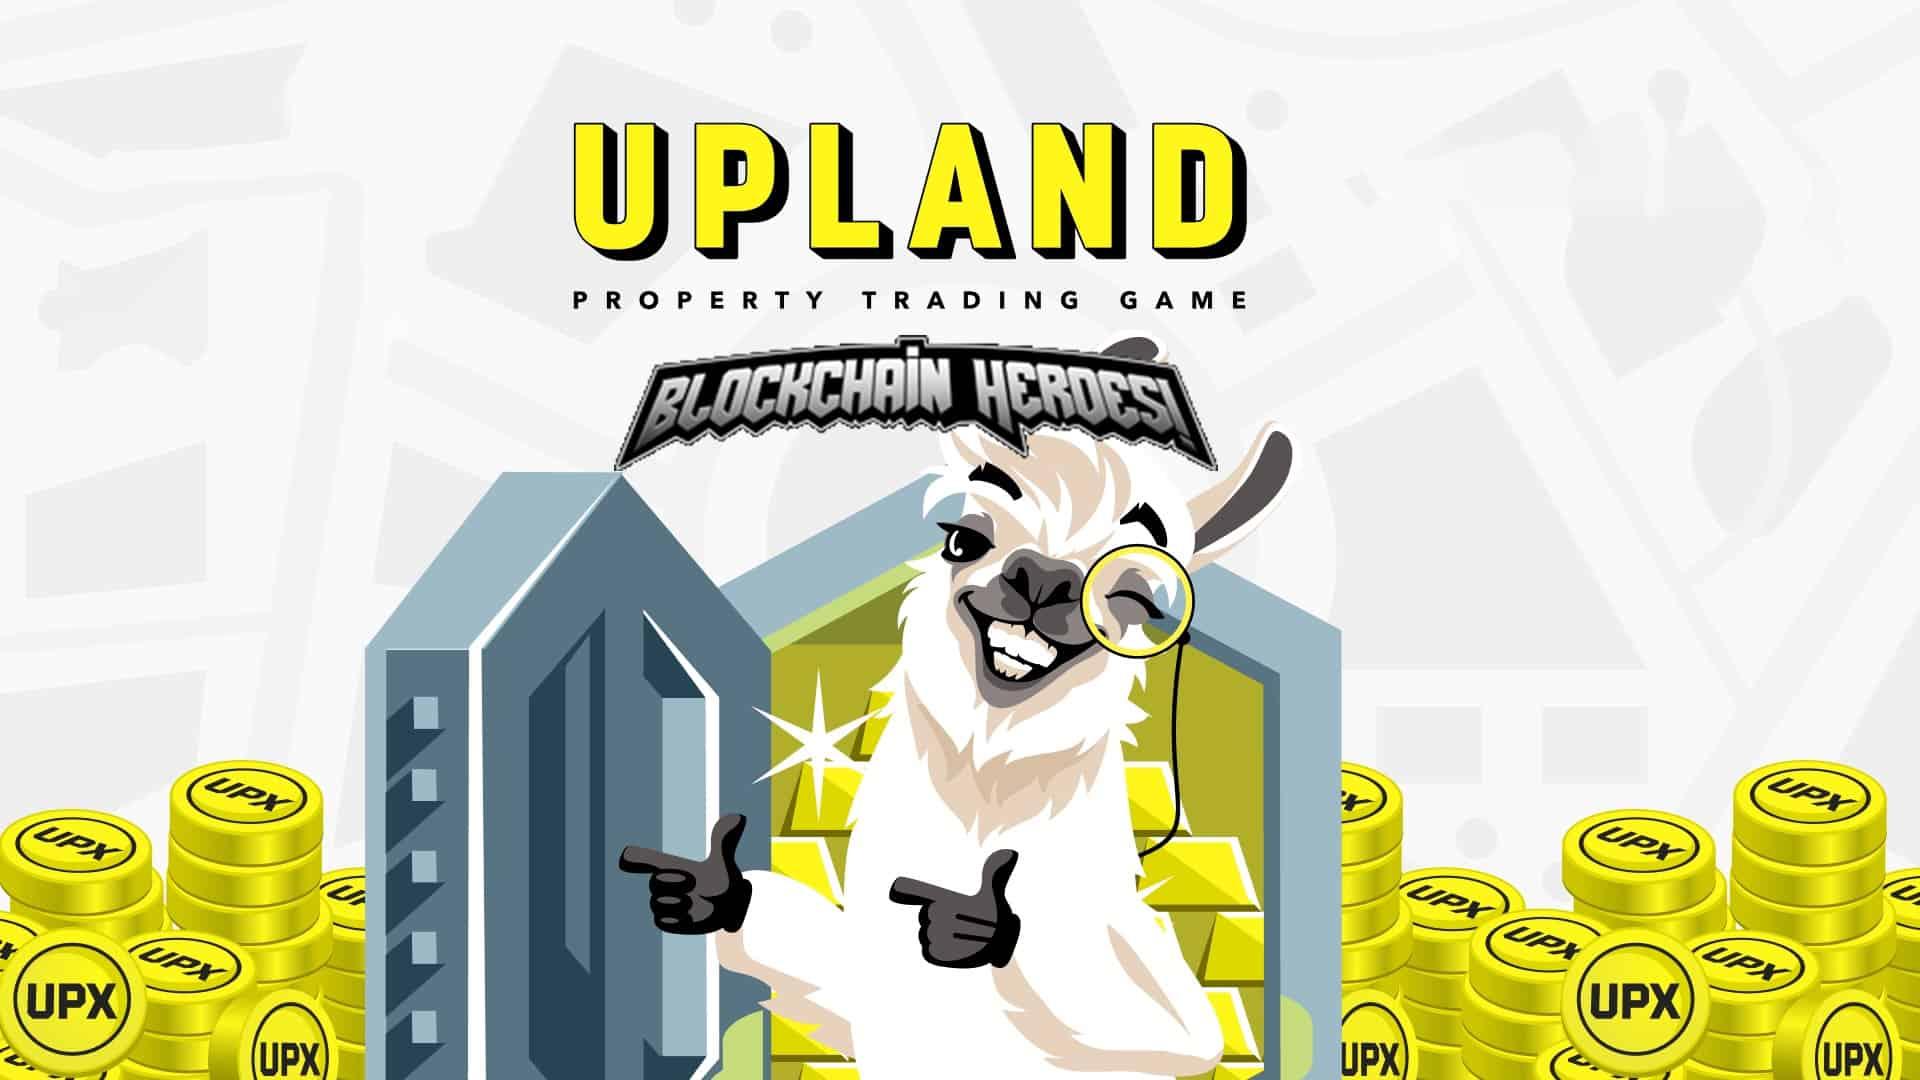 Upland Blockchain Heroes